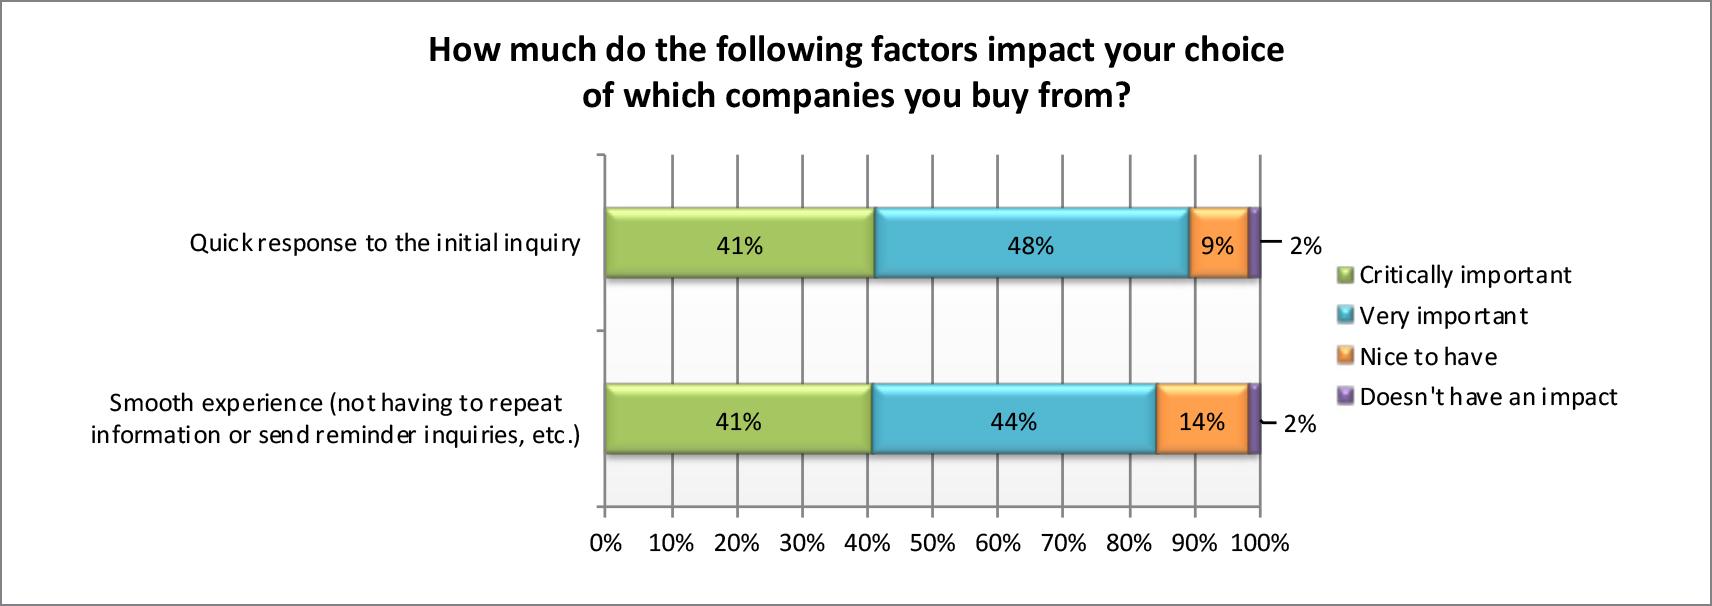 customer-retention (increase customer lifetime value (CLV))